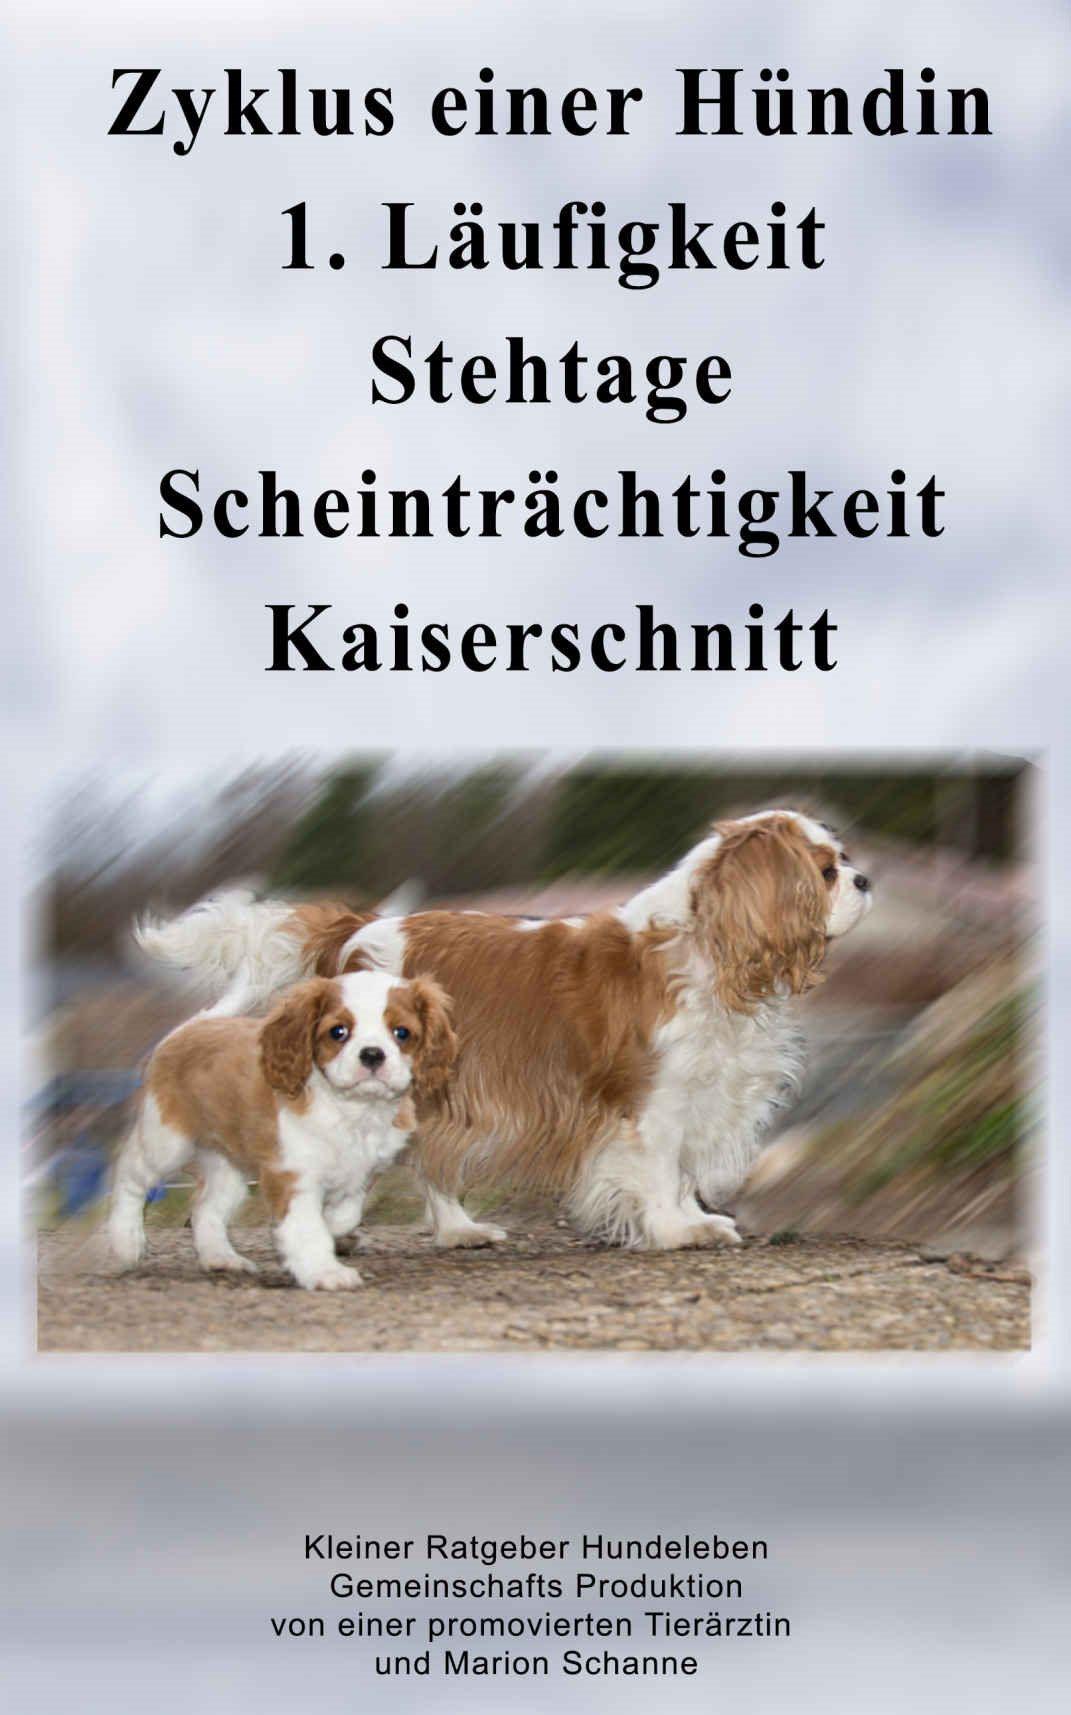 Wann Wird Eine Hundin Das Erste Mal Laufig Cavalier King Charles Spaniel Hunde King Charles Spaniel